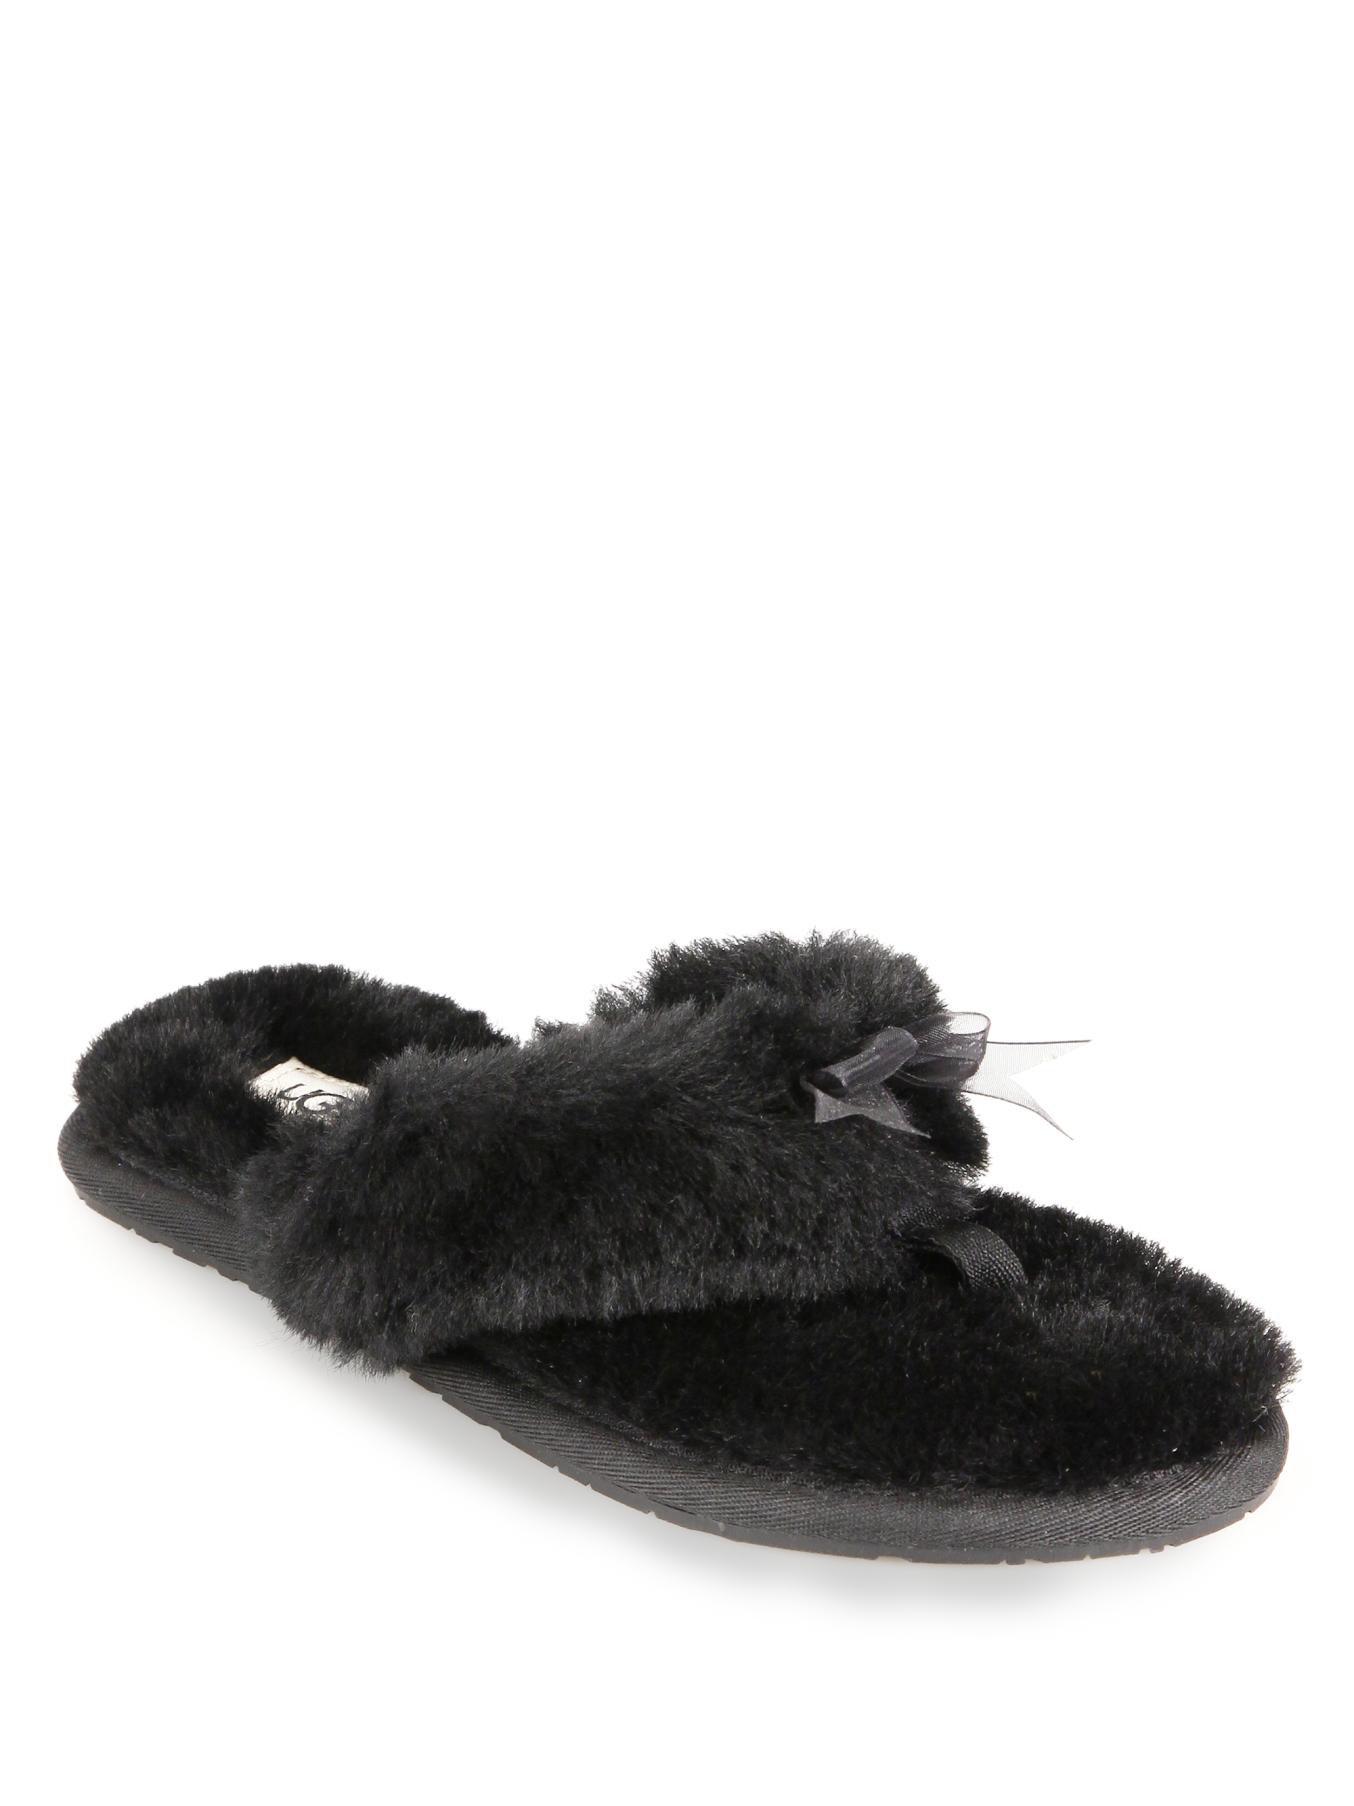 Ugg Fluff Shearling Flip Flops In Black - Lyst-2506